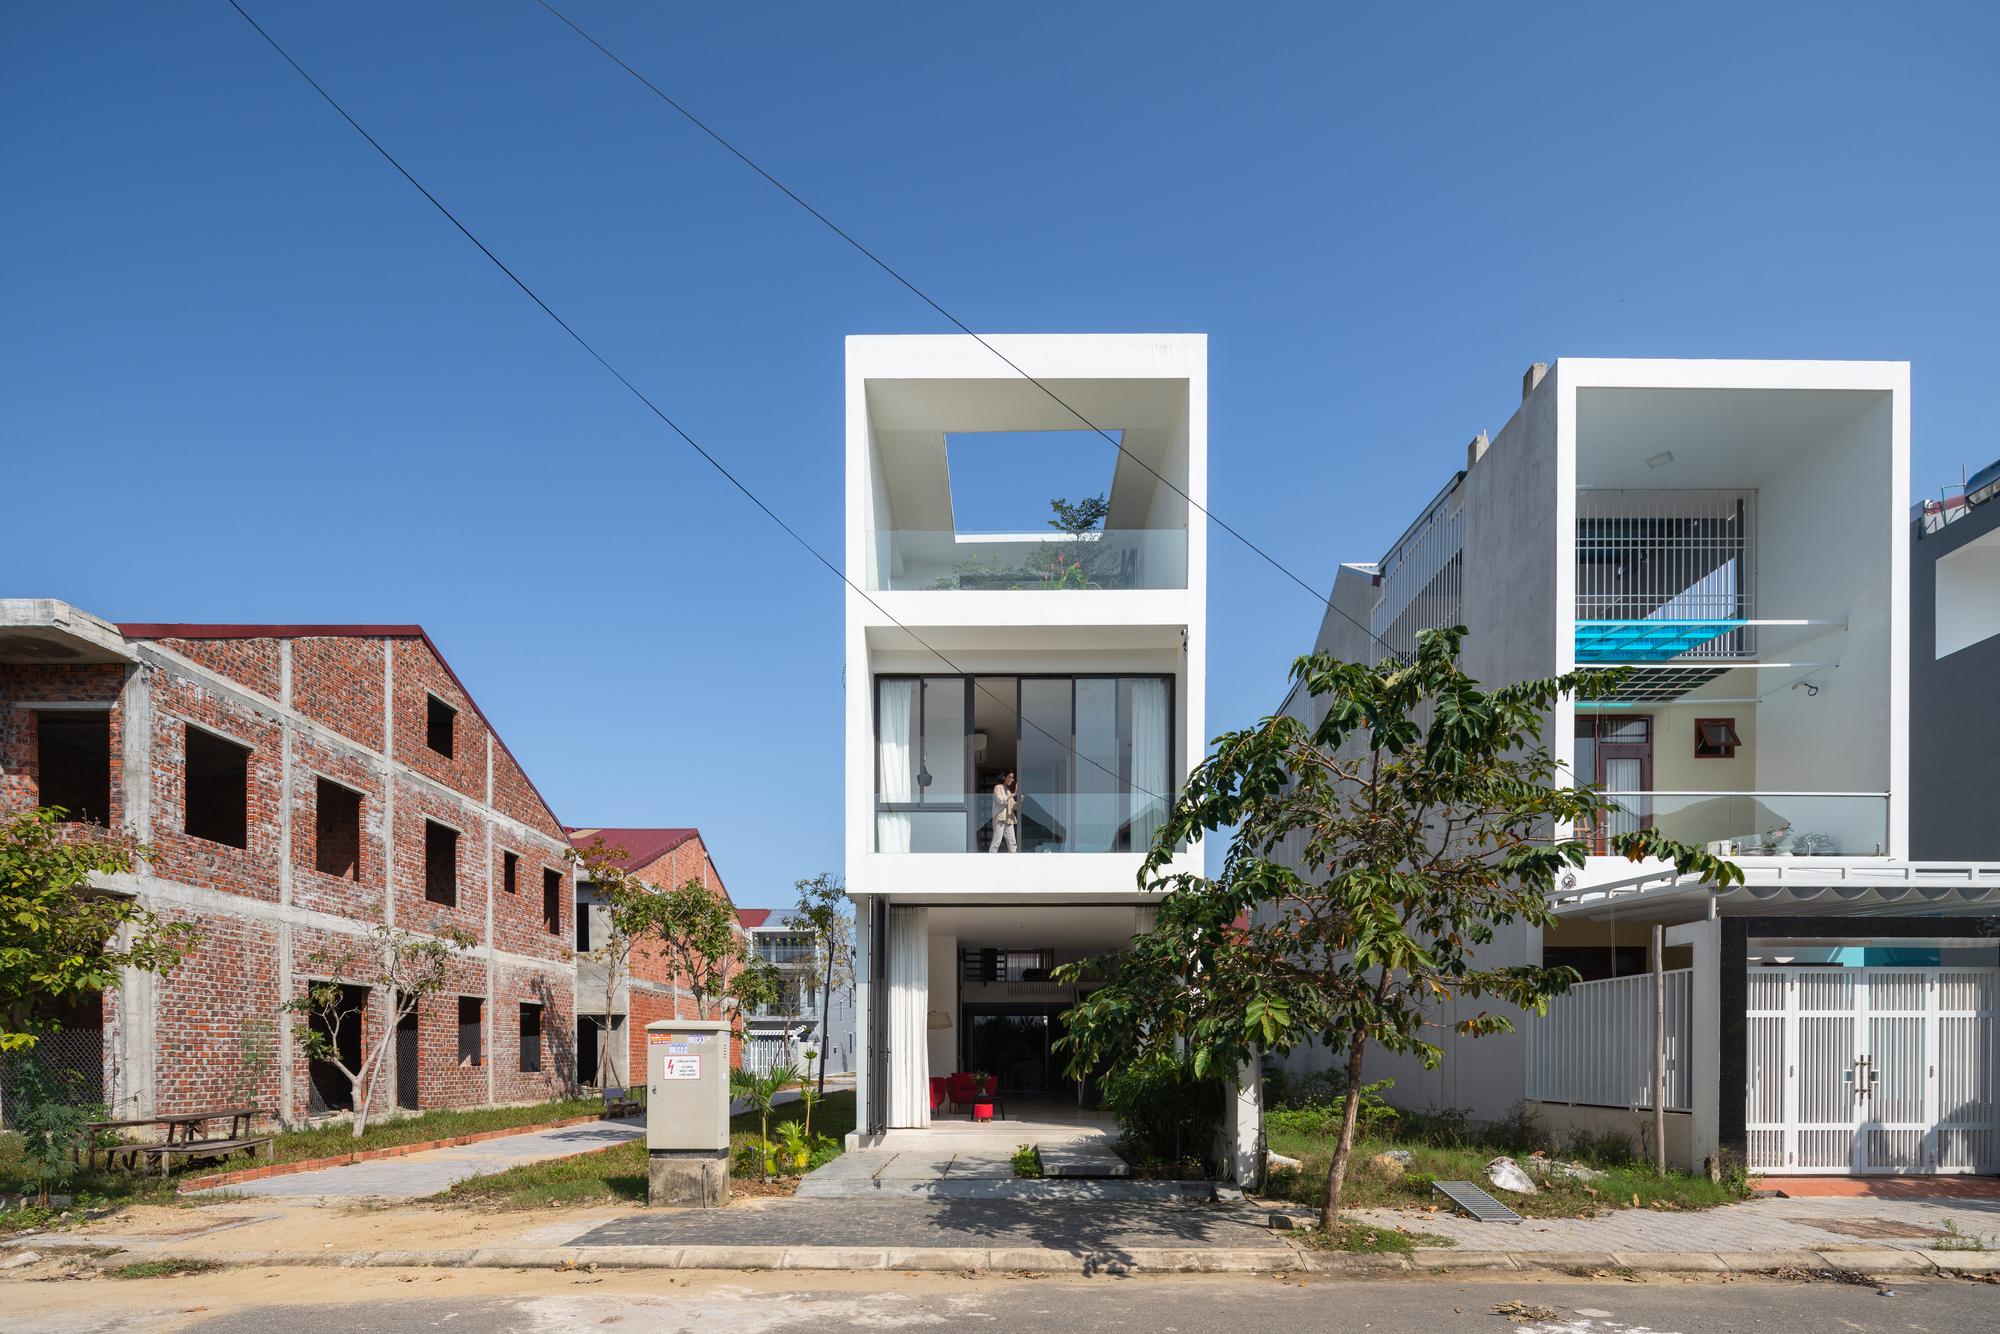 21 Century Architecture  cover image